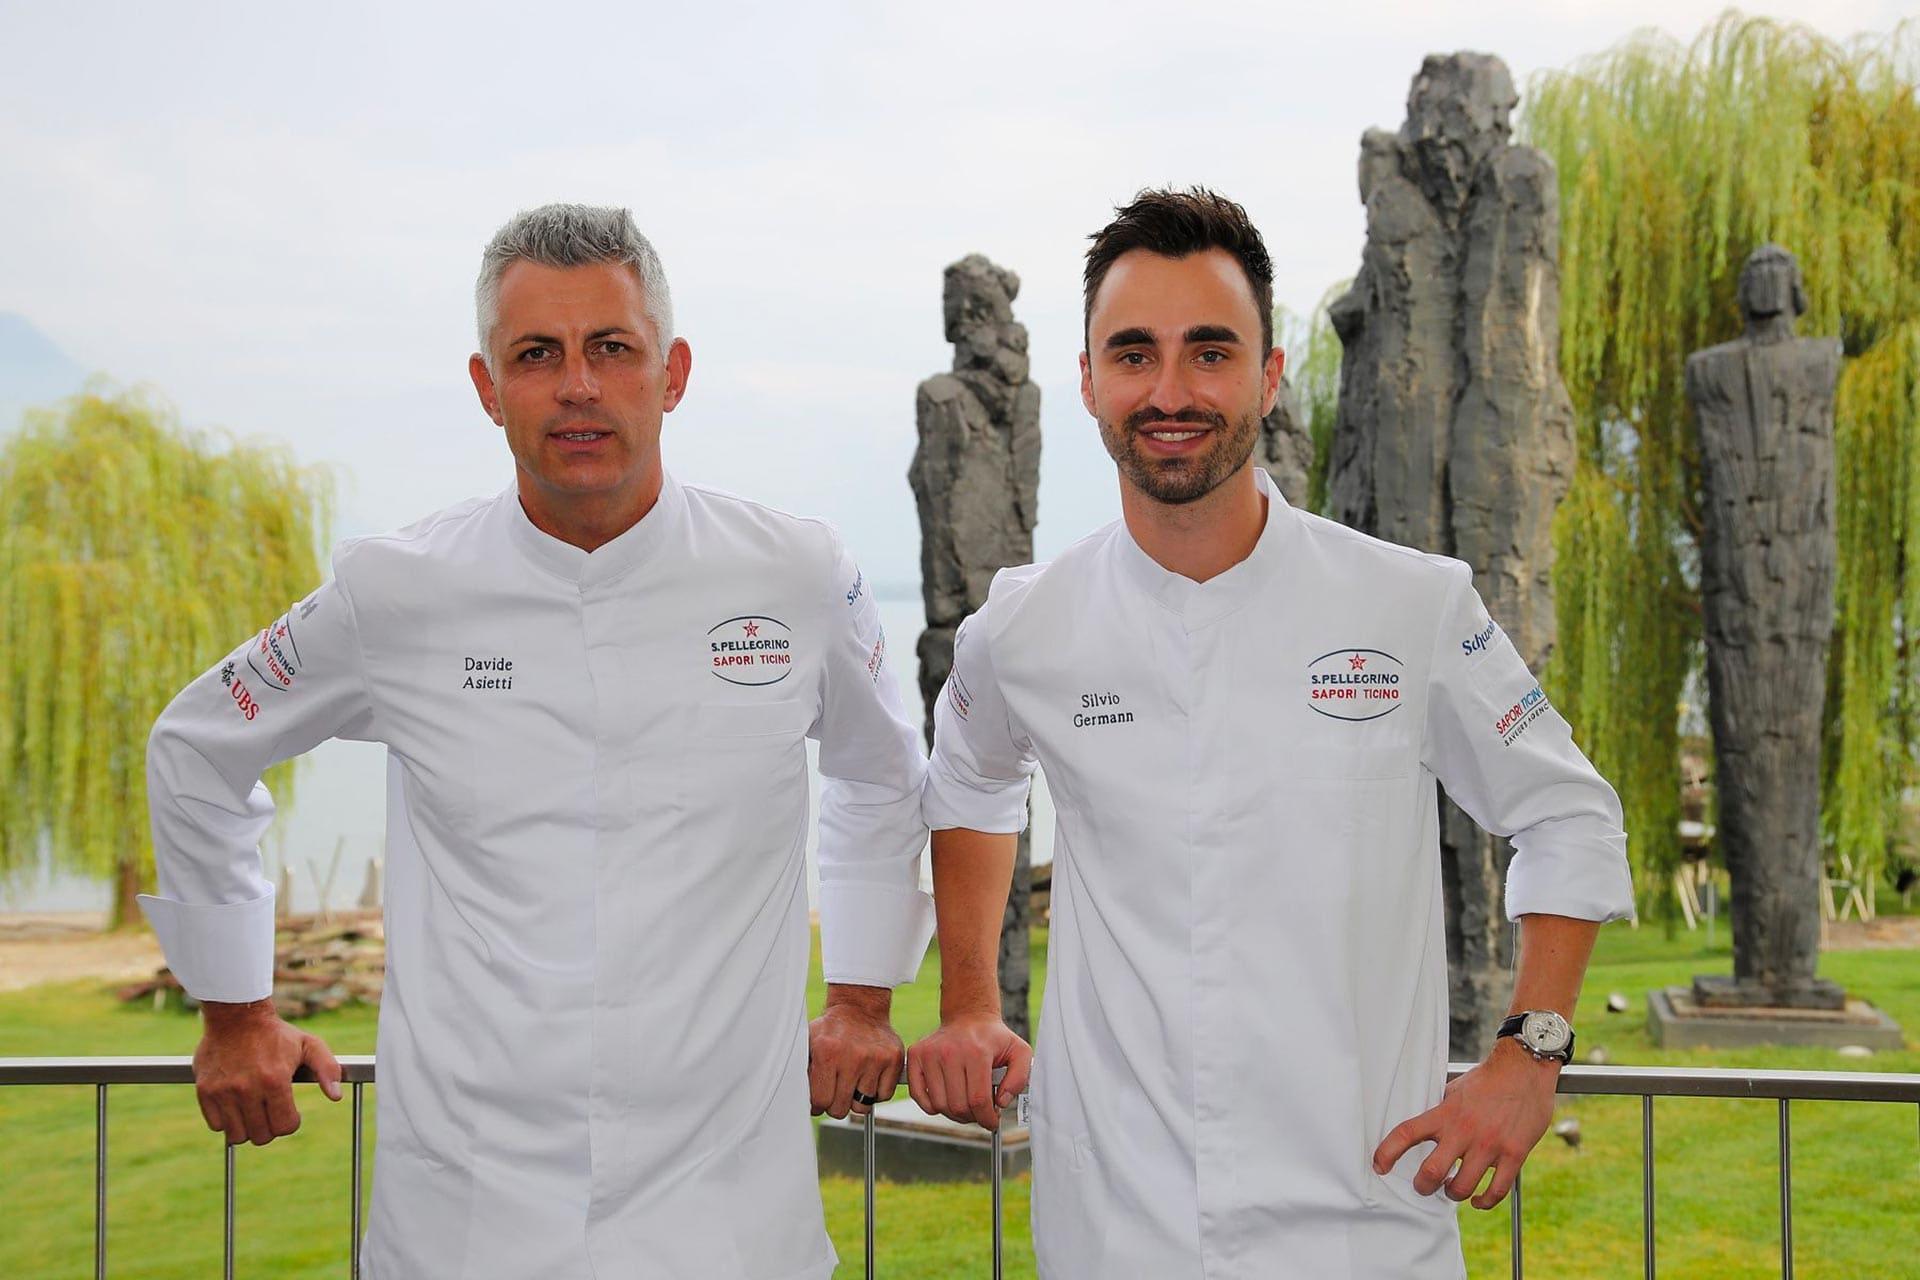 Chef Silvio Germann Davide Asietti